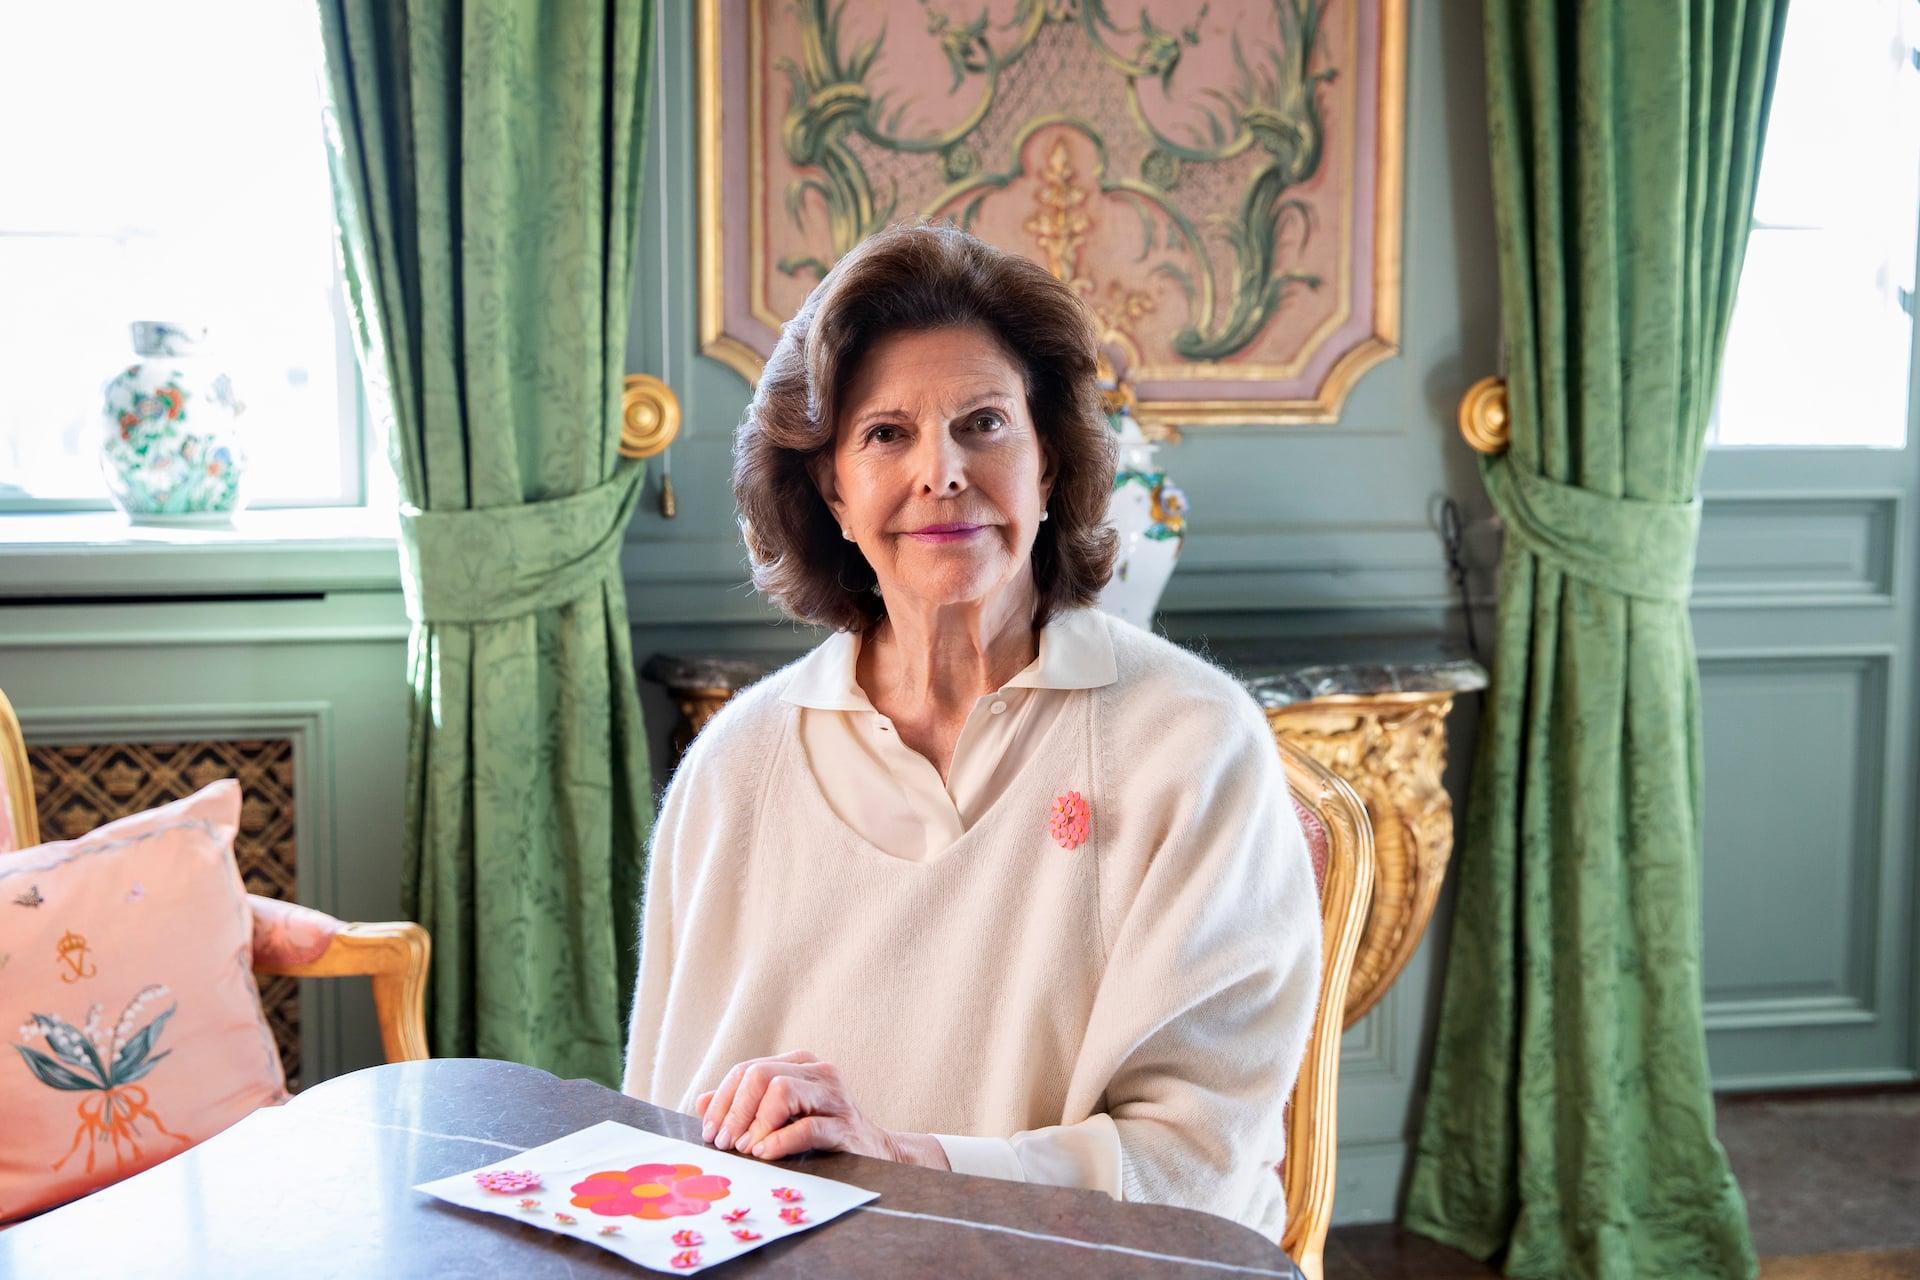 Königin Silvia Handgelenk